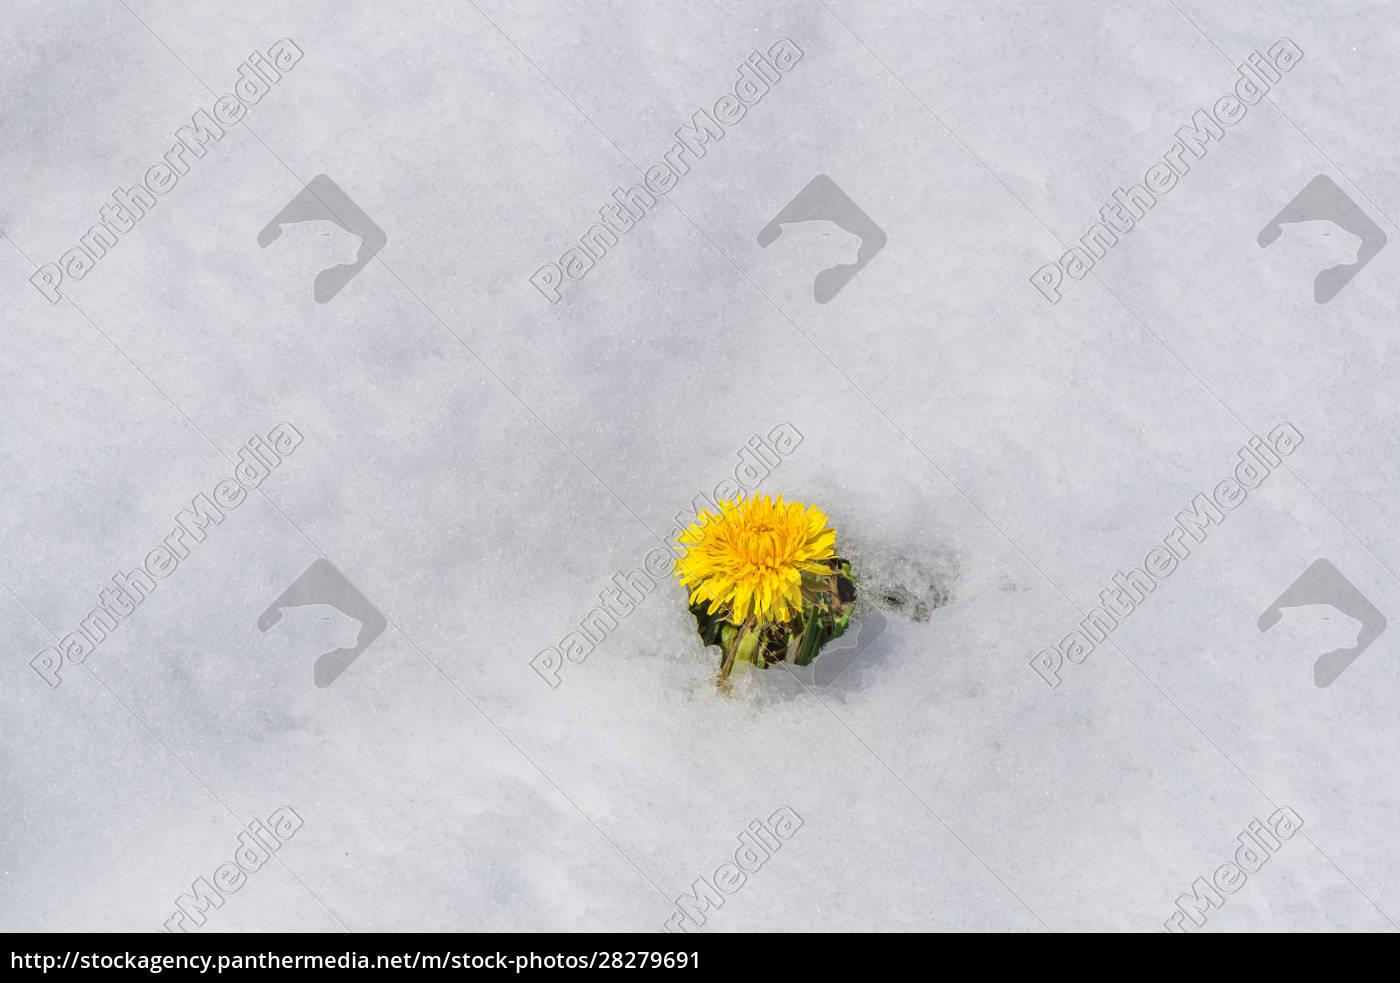 the, dandelion, blooms, despite, snow - 28279691